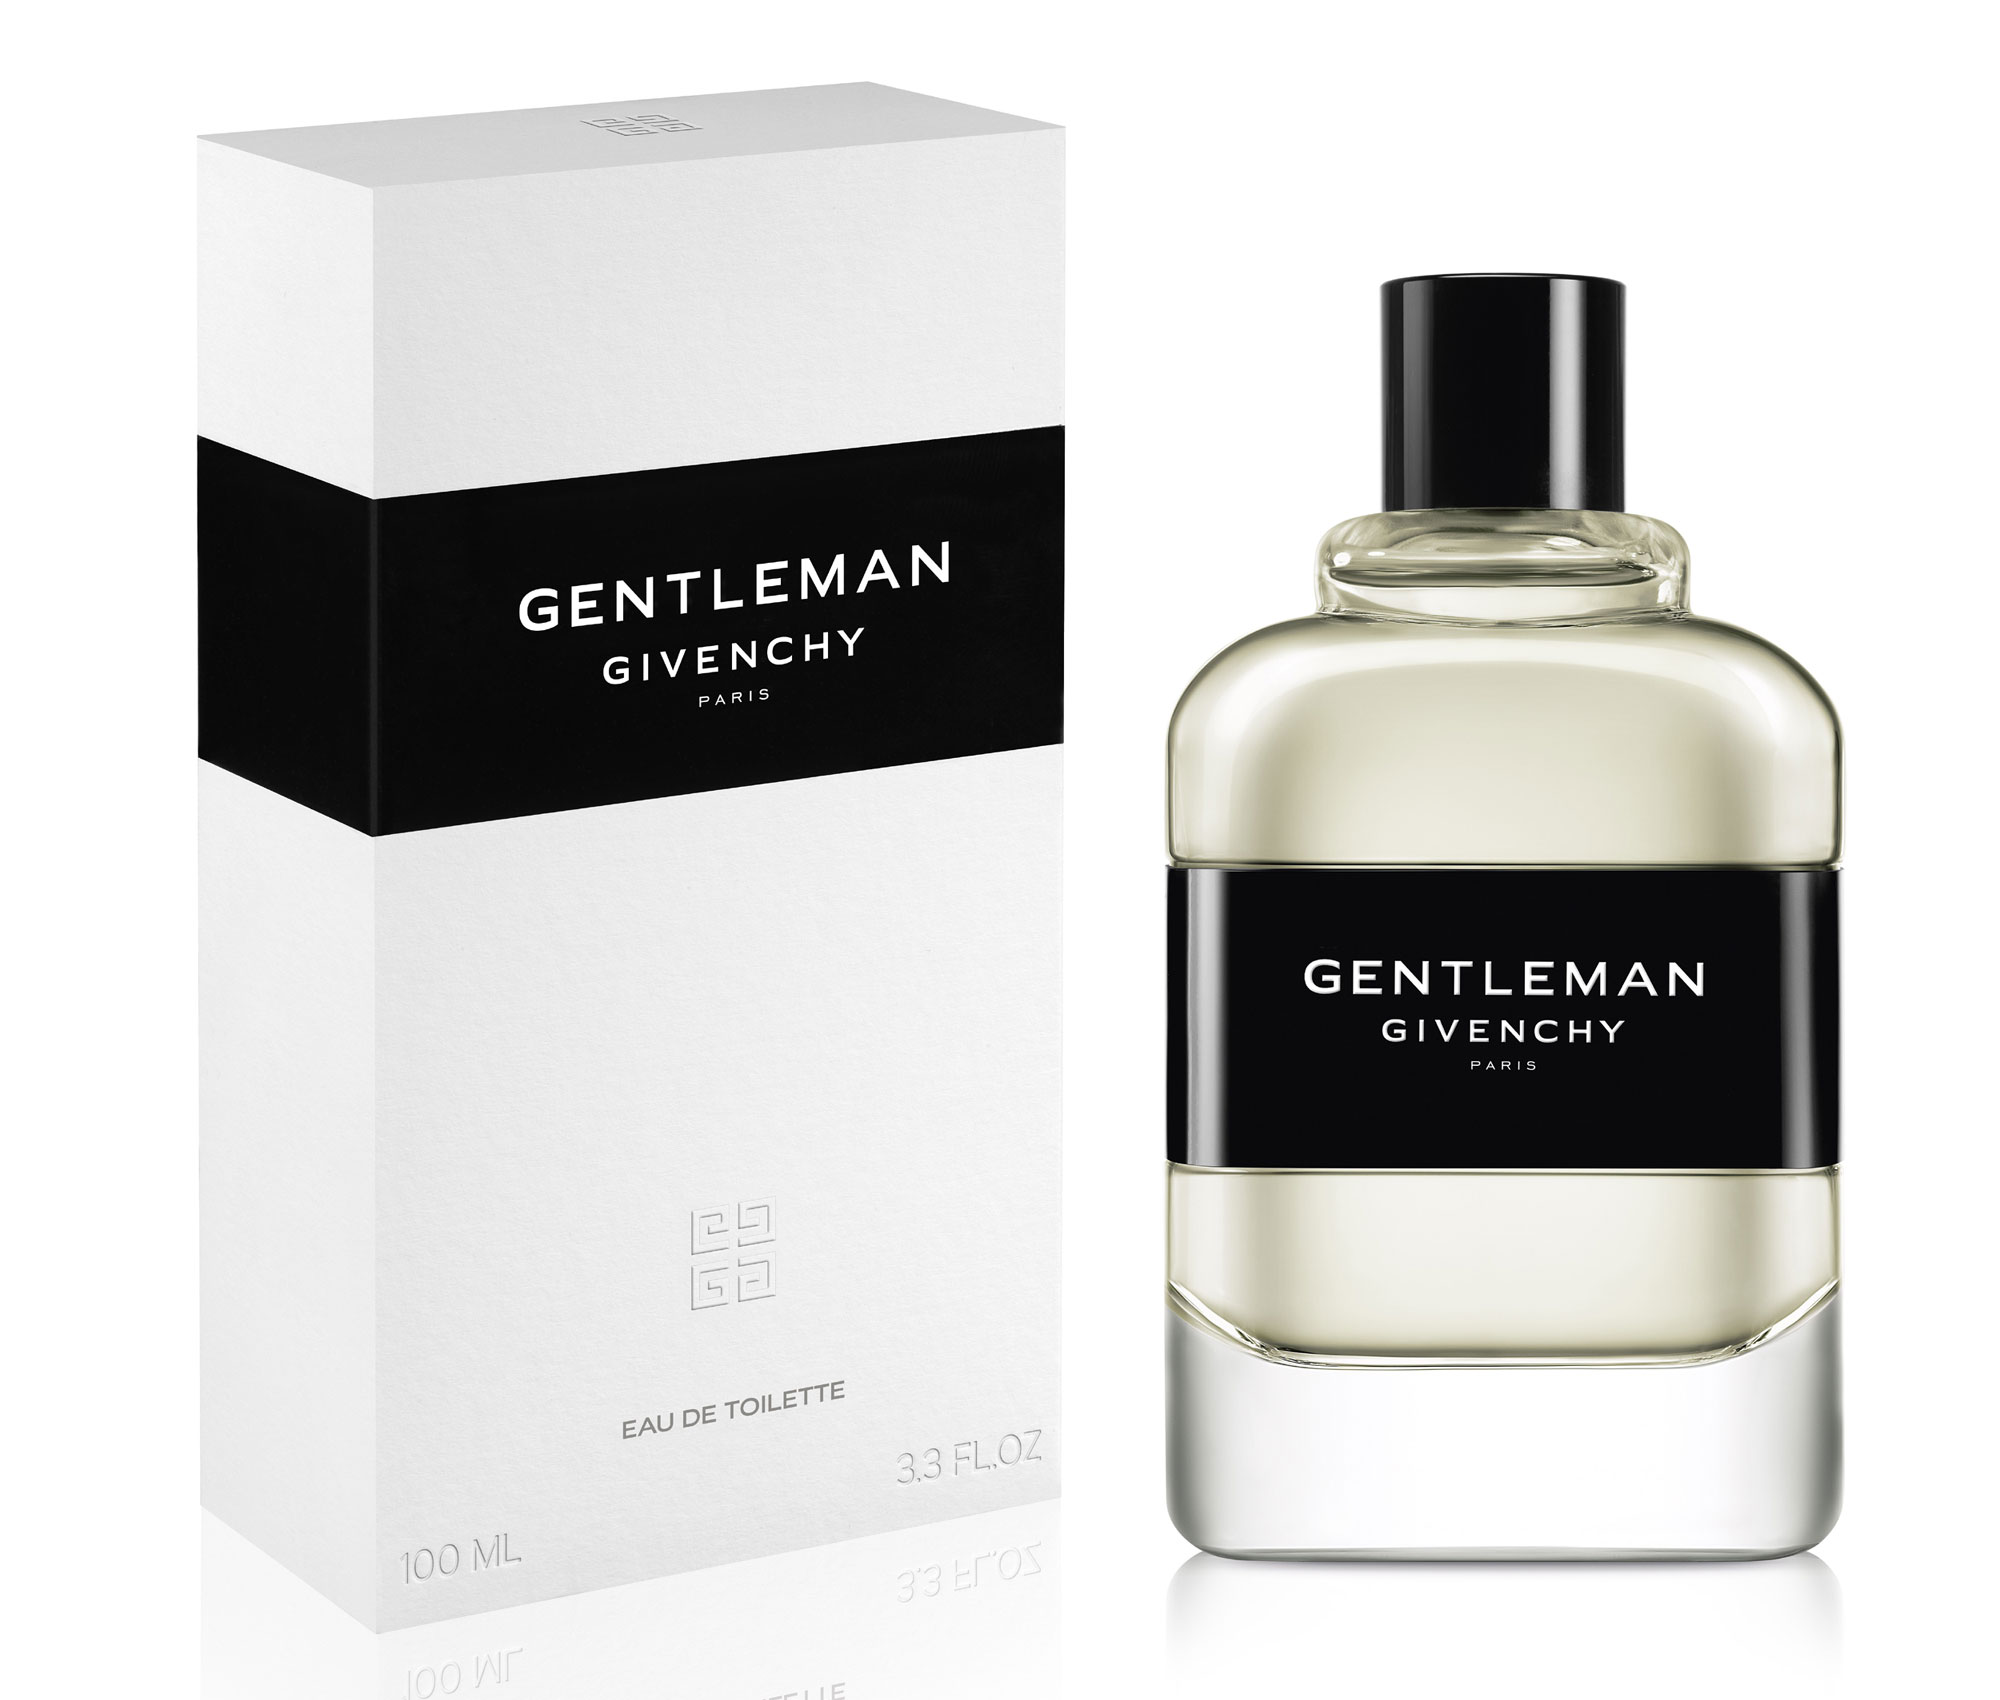 Givenchy Gentleman 2017 bottle box.jpg